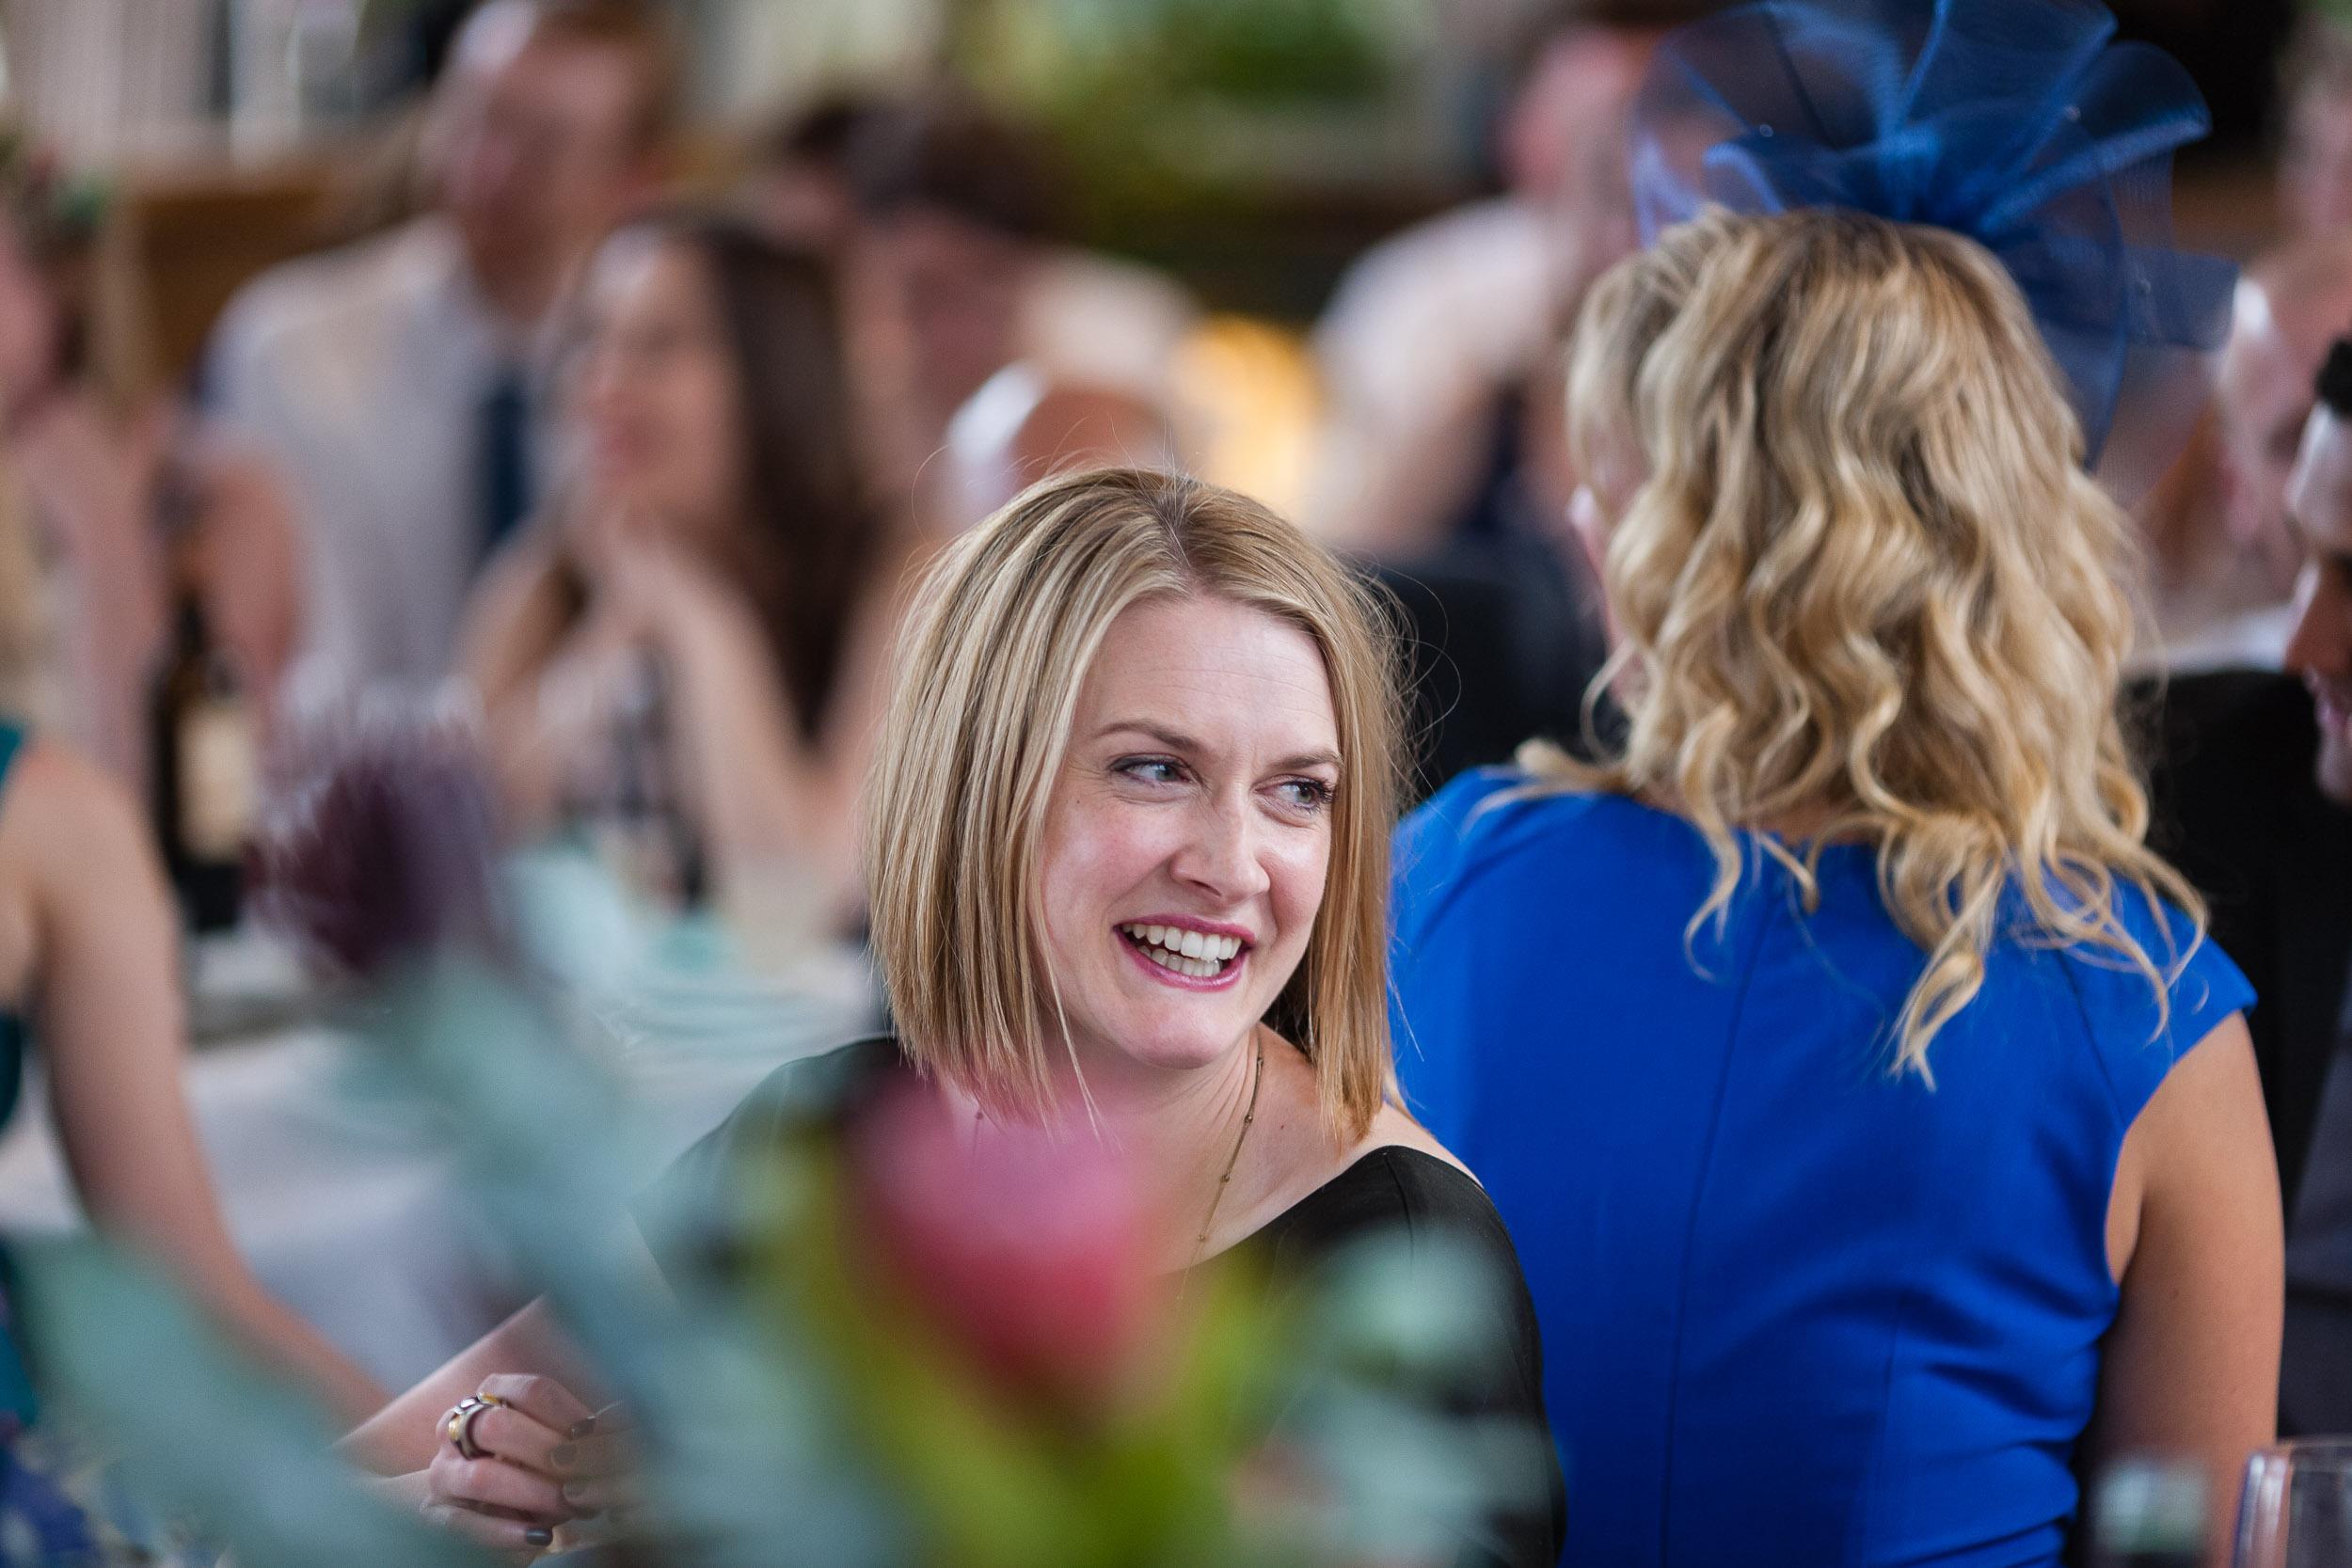 brockwell-lido-brixton-herne-hill-wedding-369.jpg